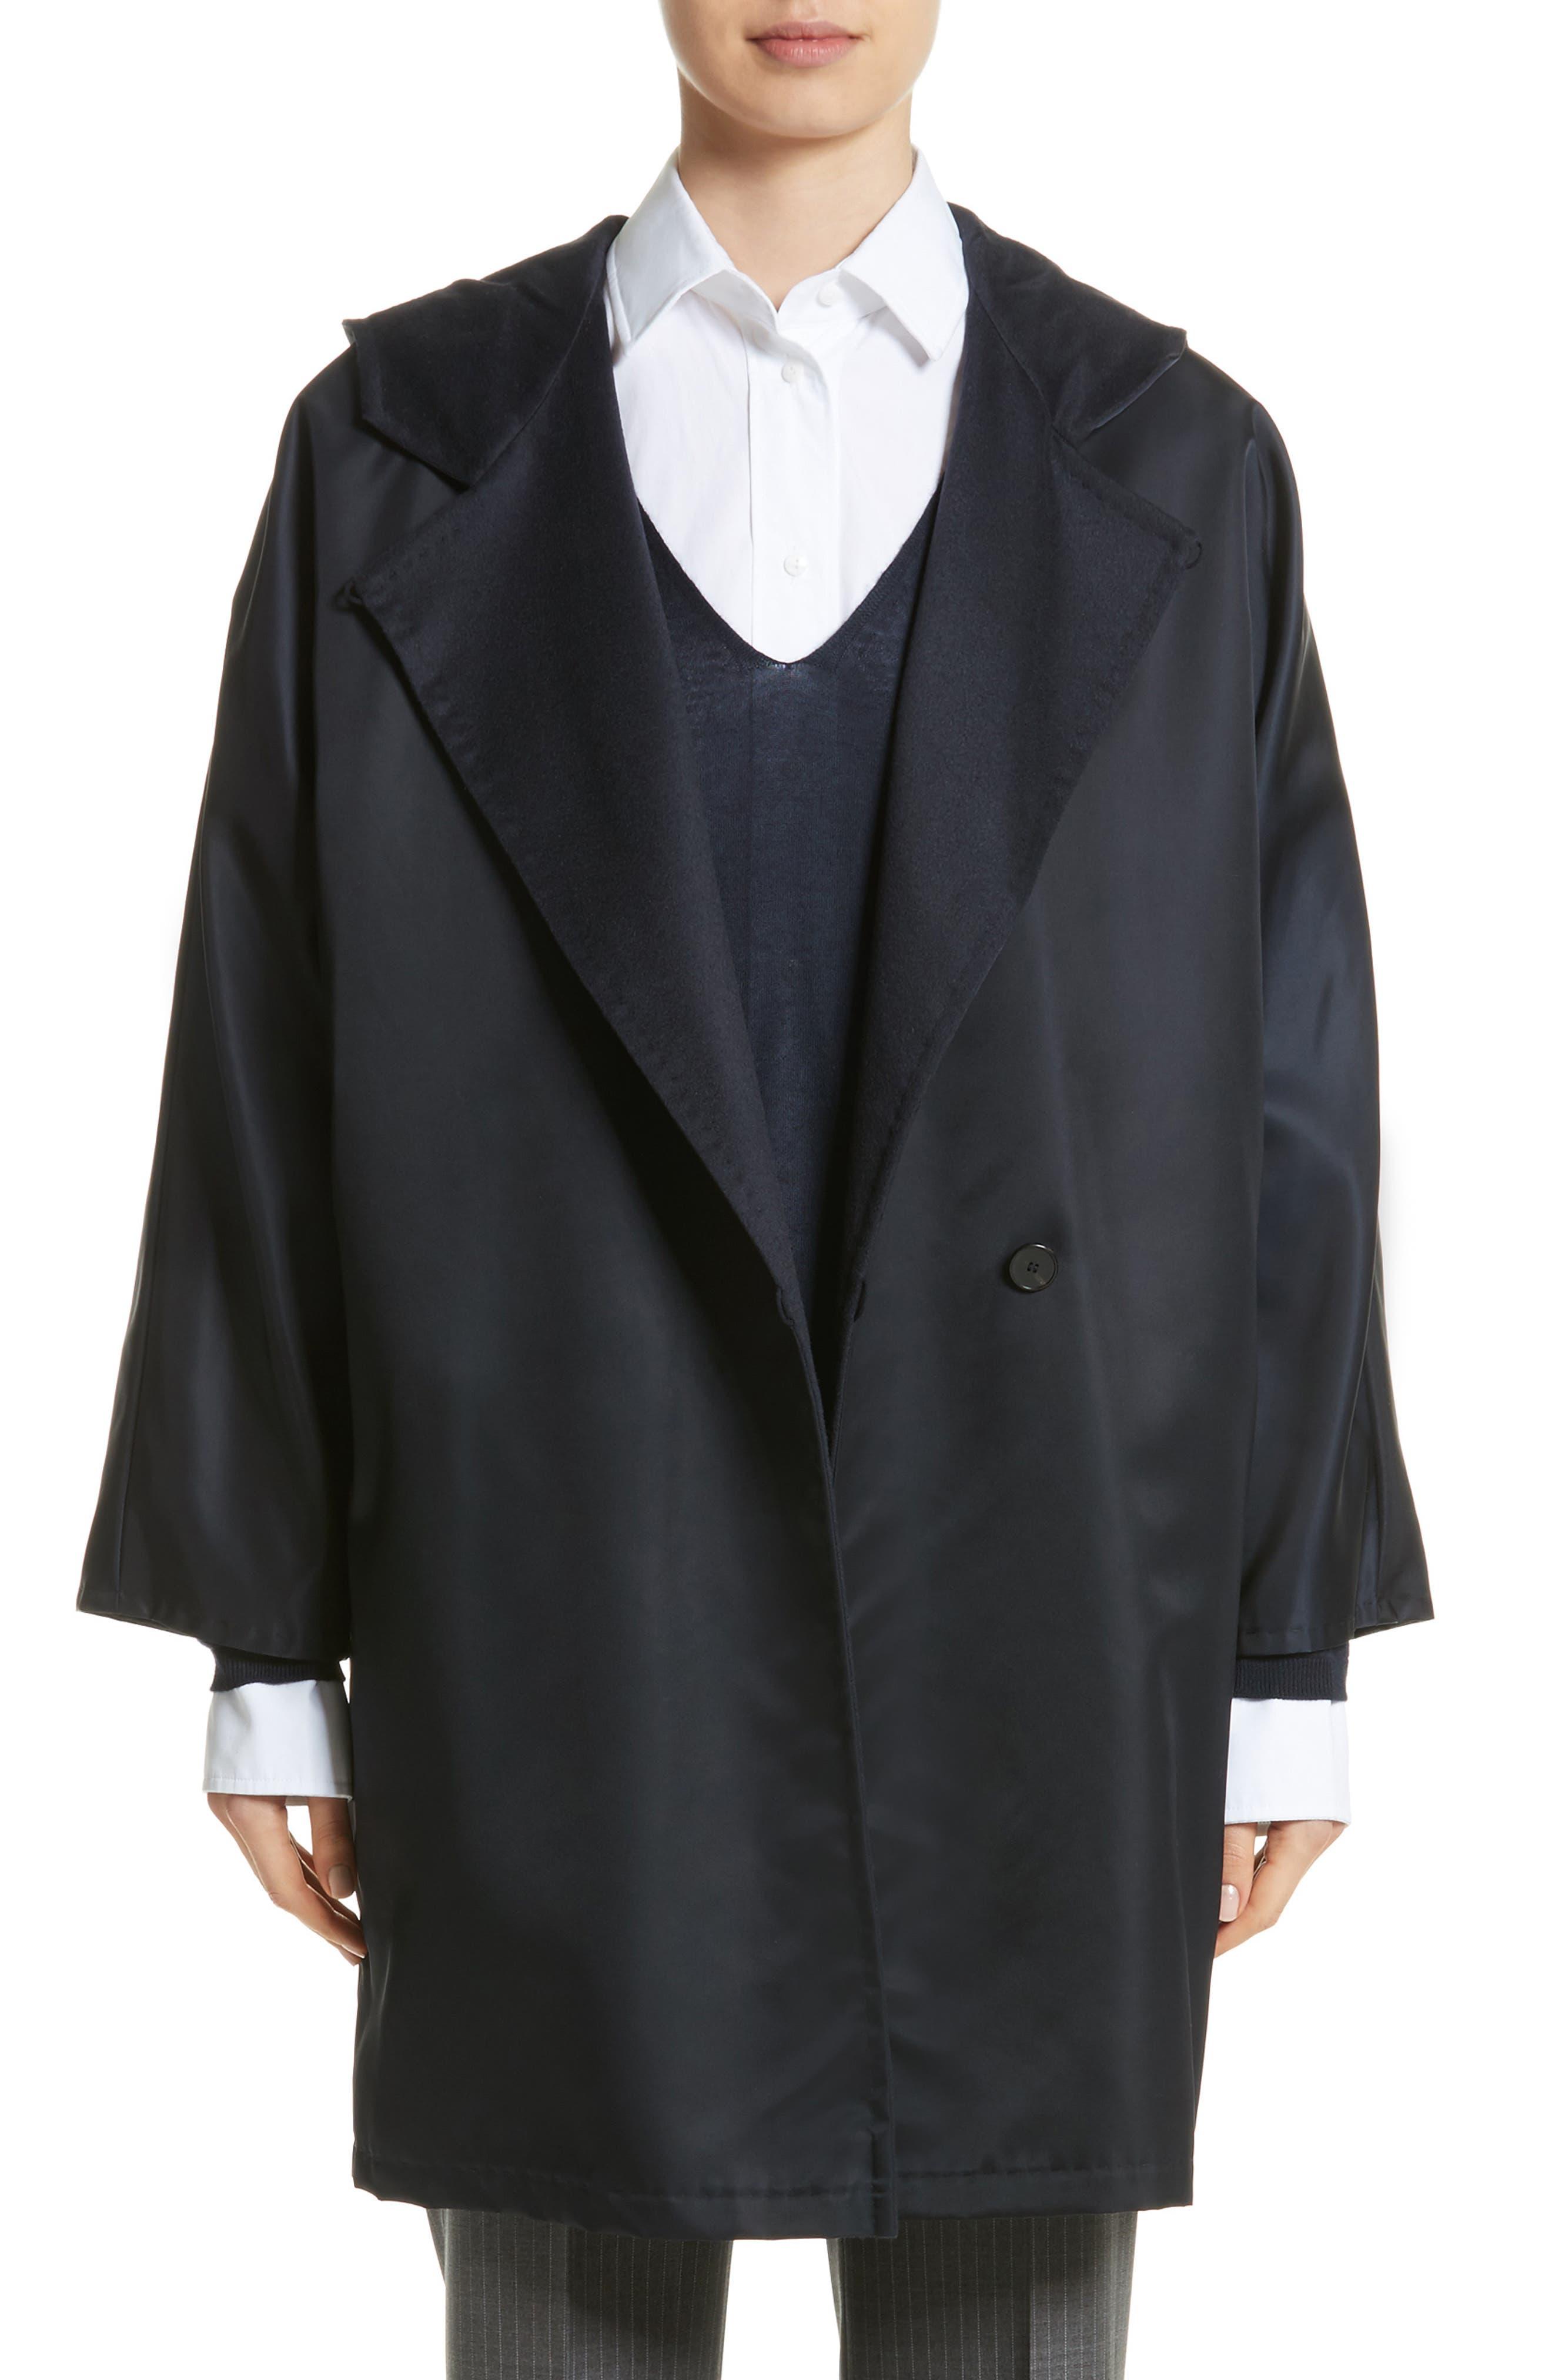 Jacopo Reversible Hooded Coat,                         Main,                         color,